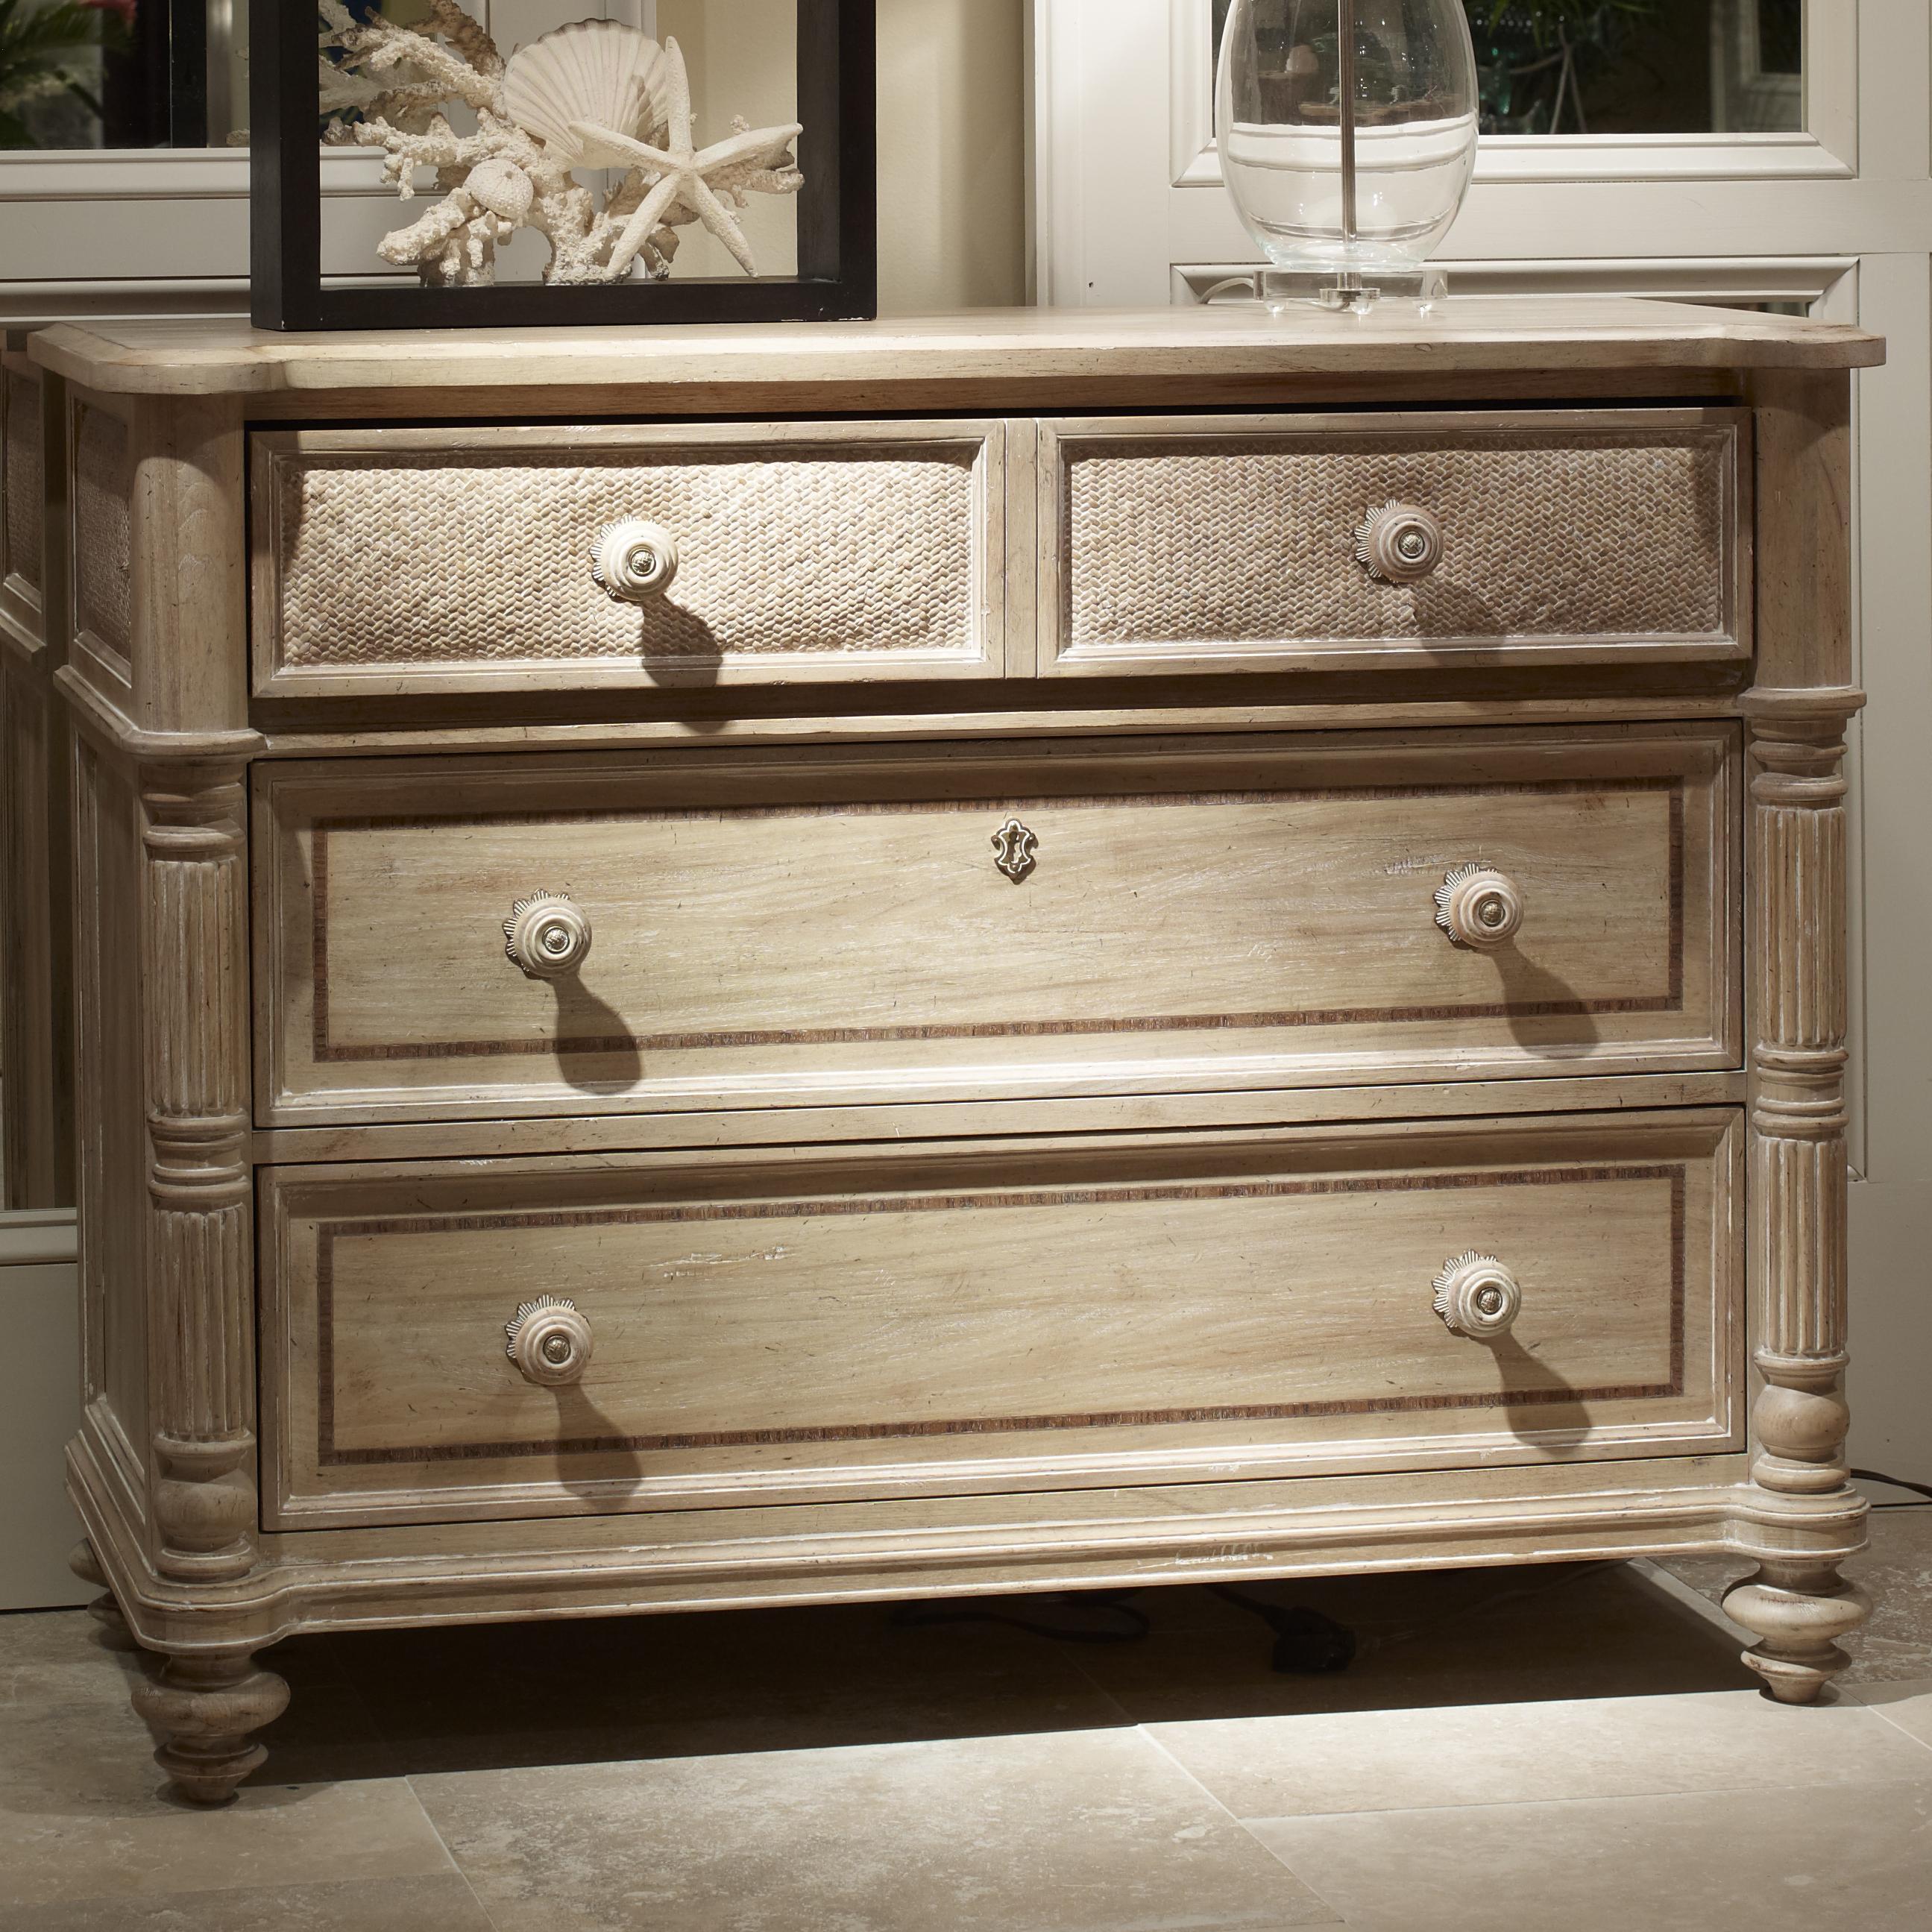 Fine Furniture Design Palm Island Tasman Single Dresser With 2 Drawers And  1 Drop Down Drawer